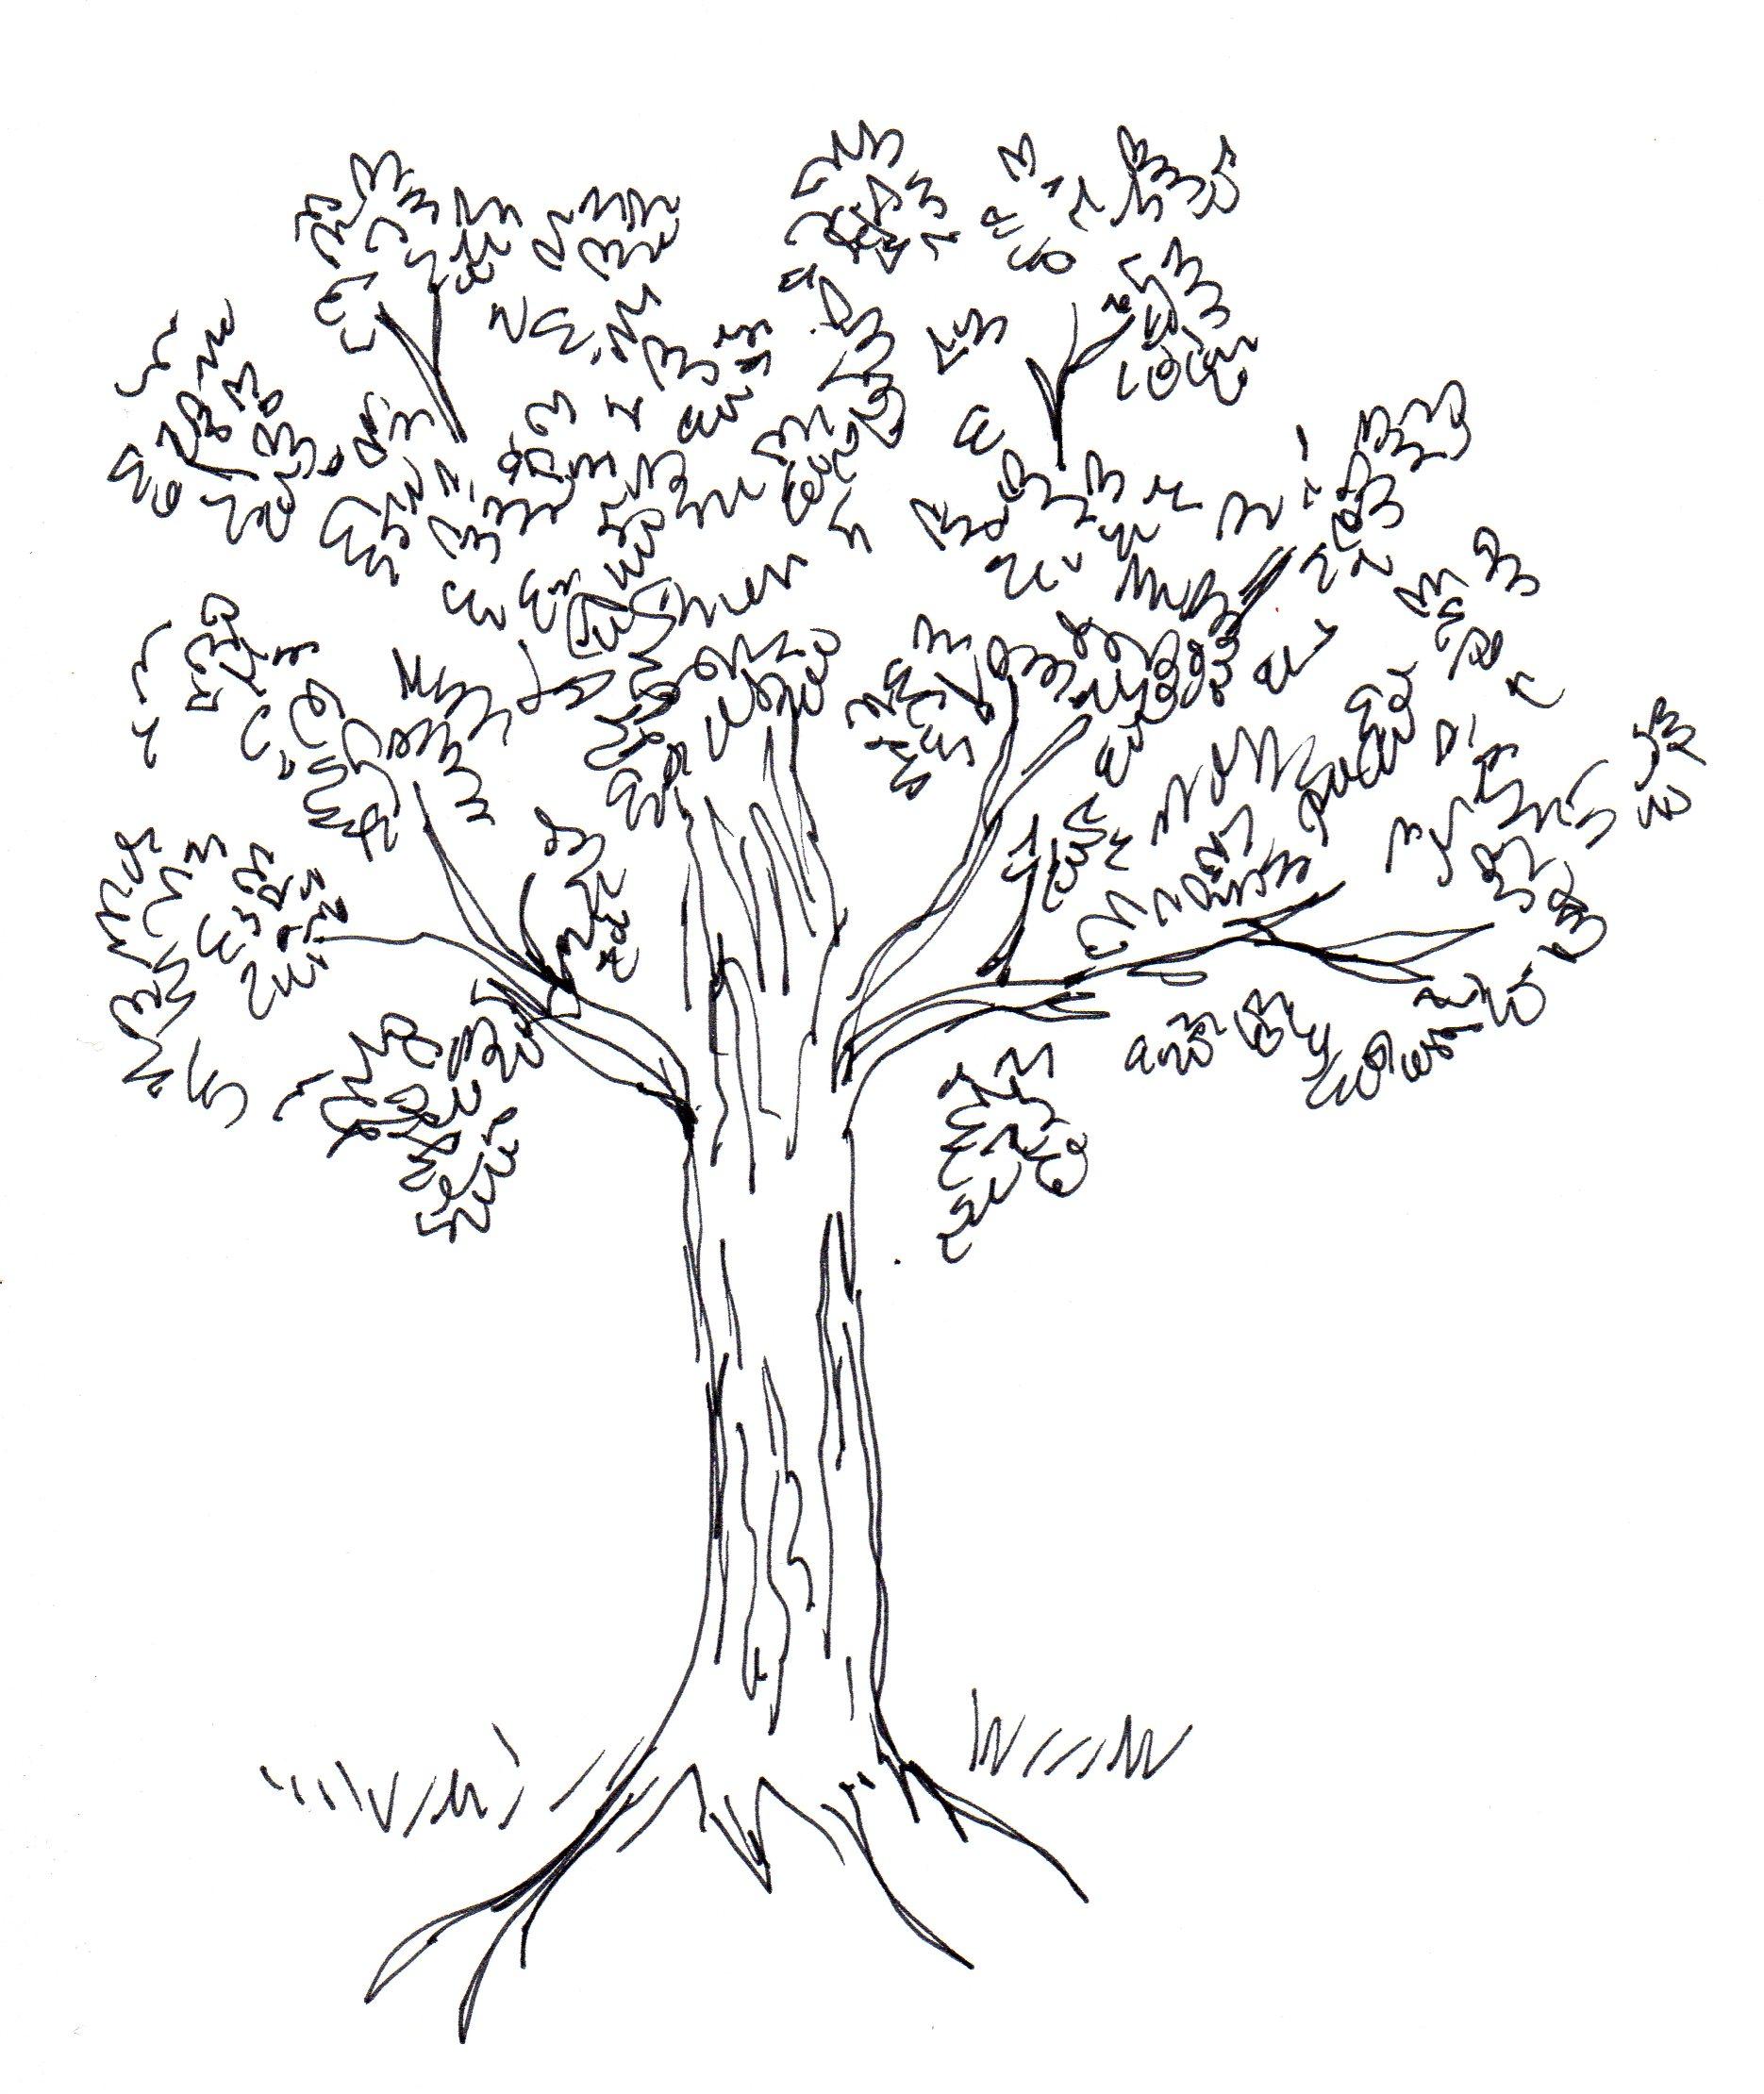 Tree scumbling